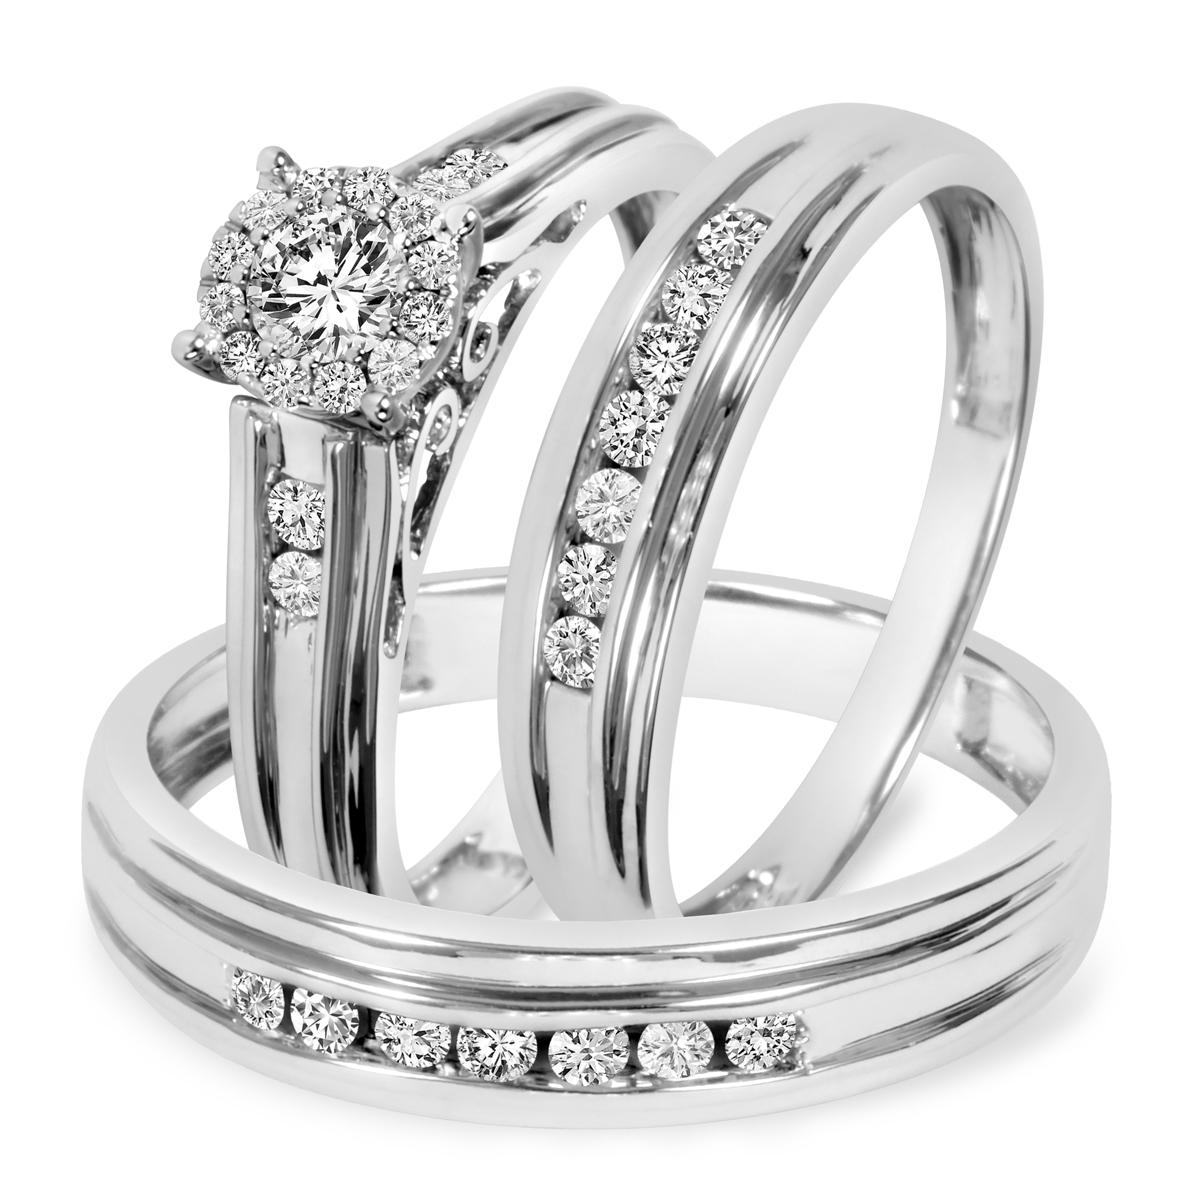 3/4 Carat T.W. Round Cut Diamond Women's Engagement Ring, Ladies Wedding Band,